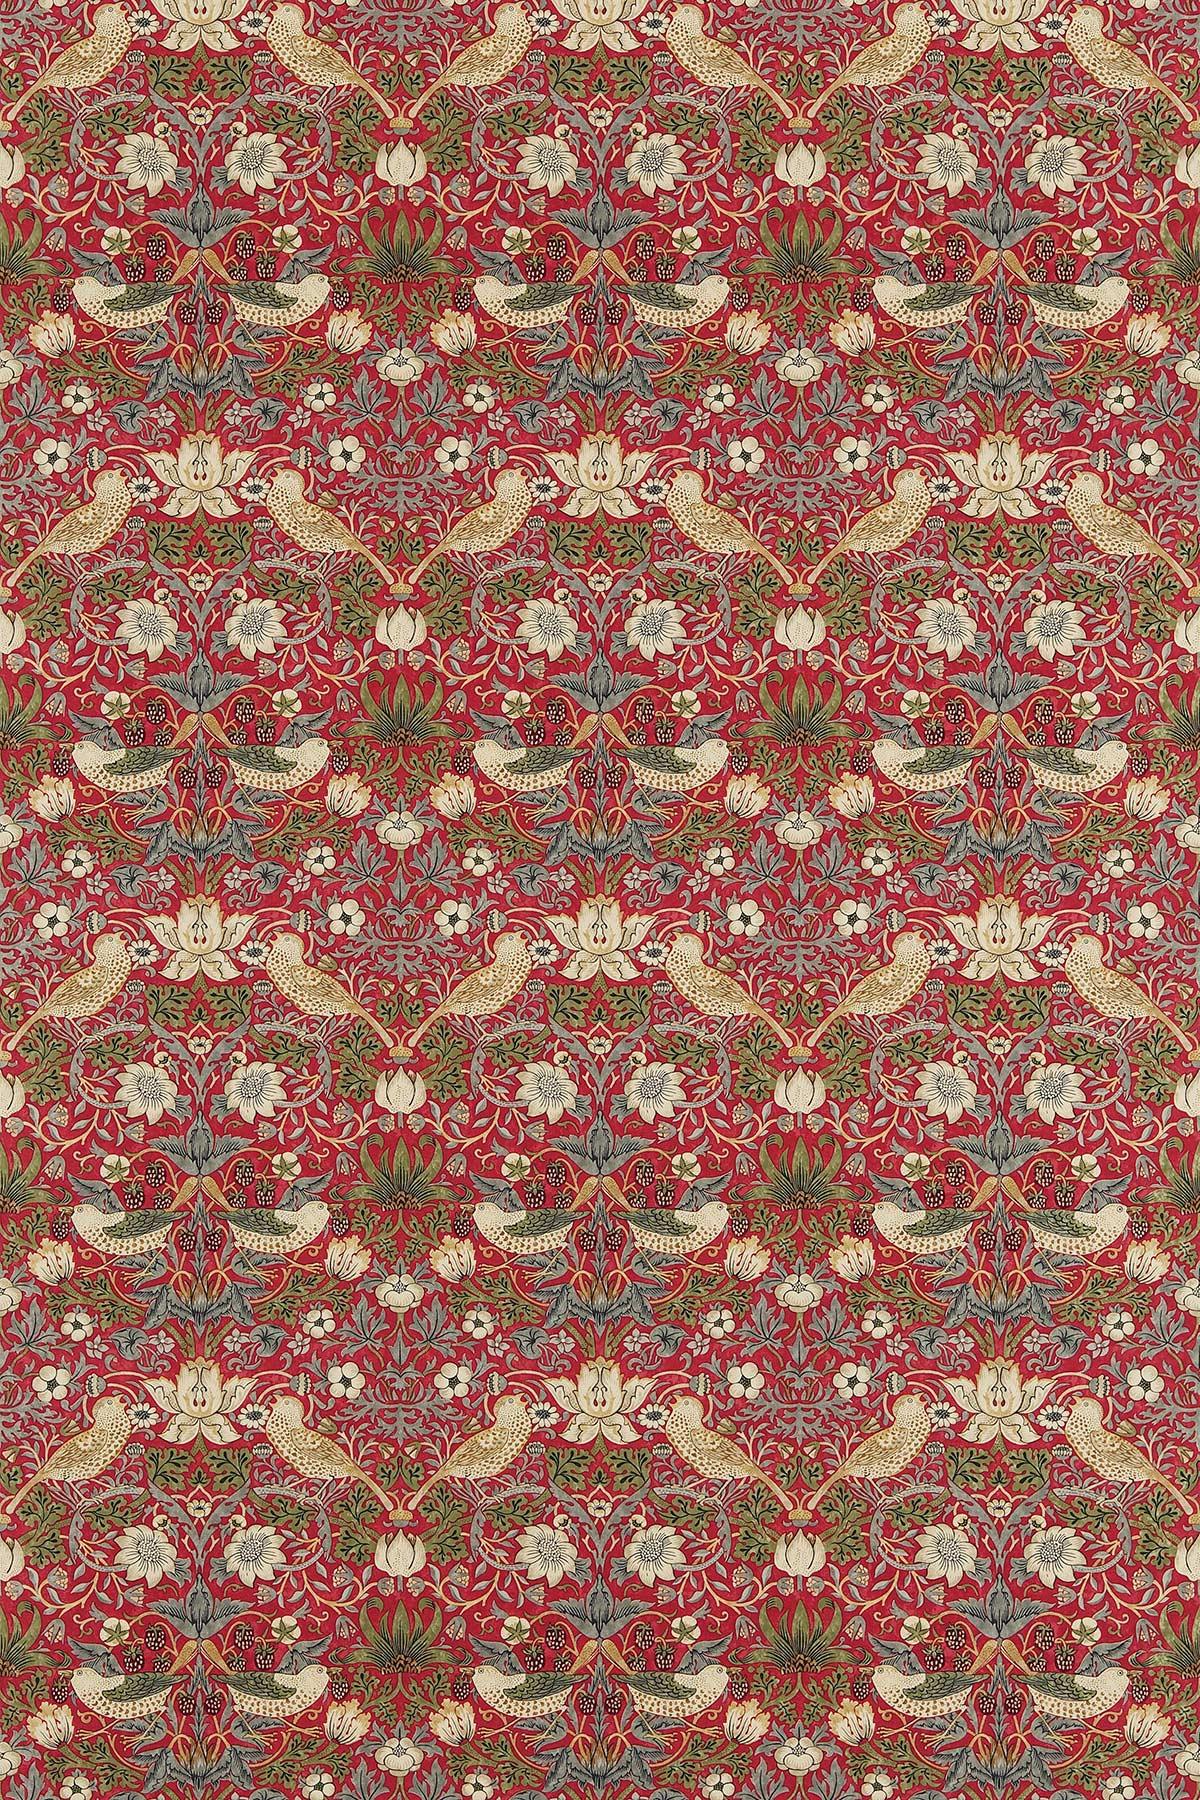 Strawberry Thief Fabric - Crimson / Slate - by Morris